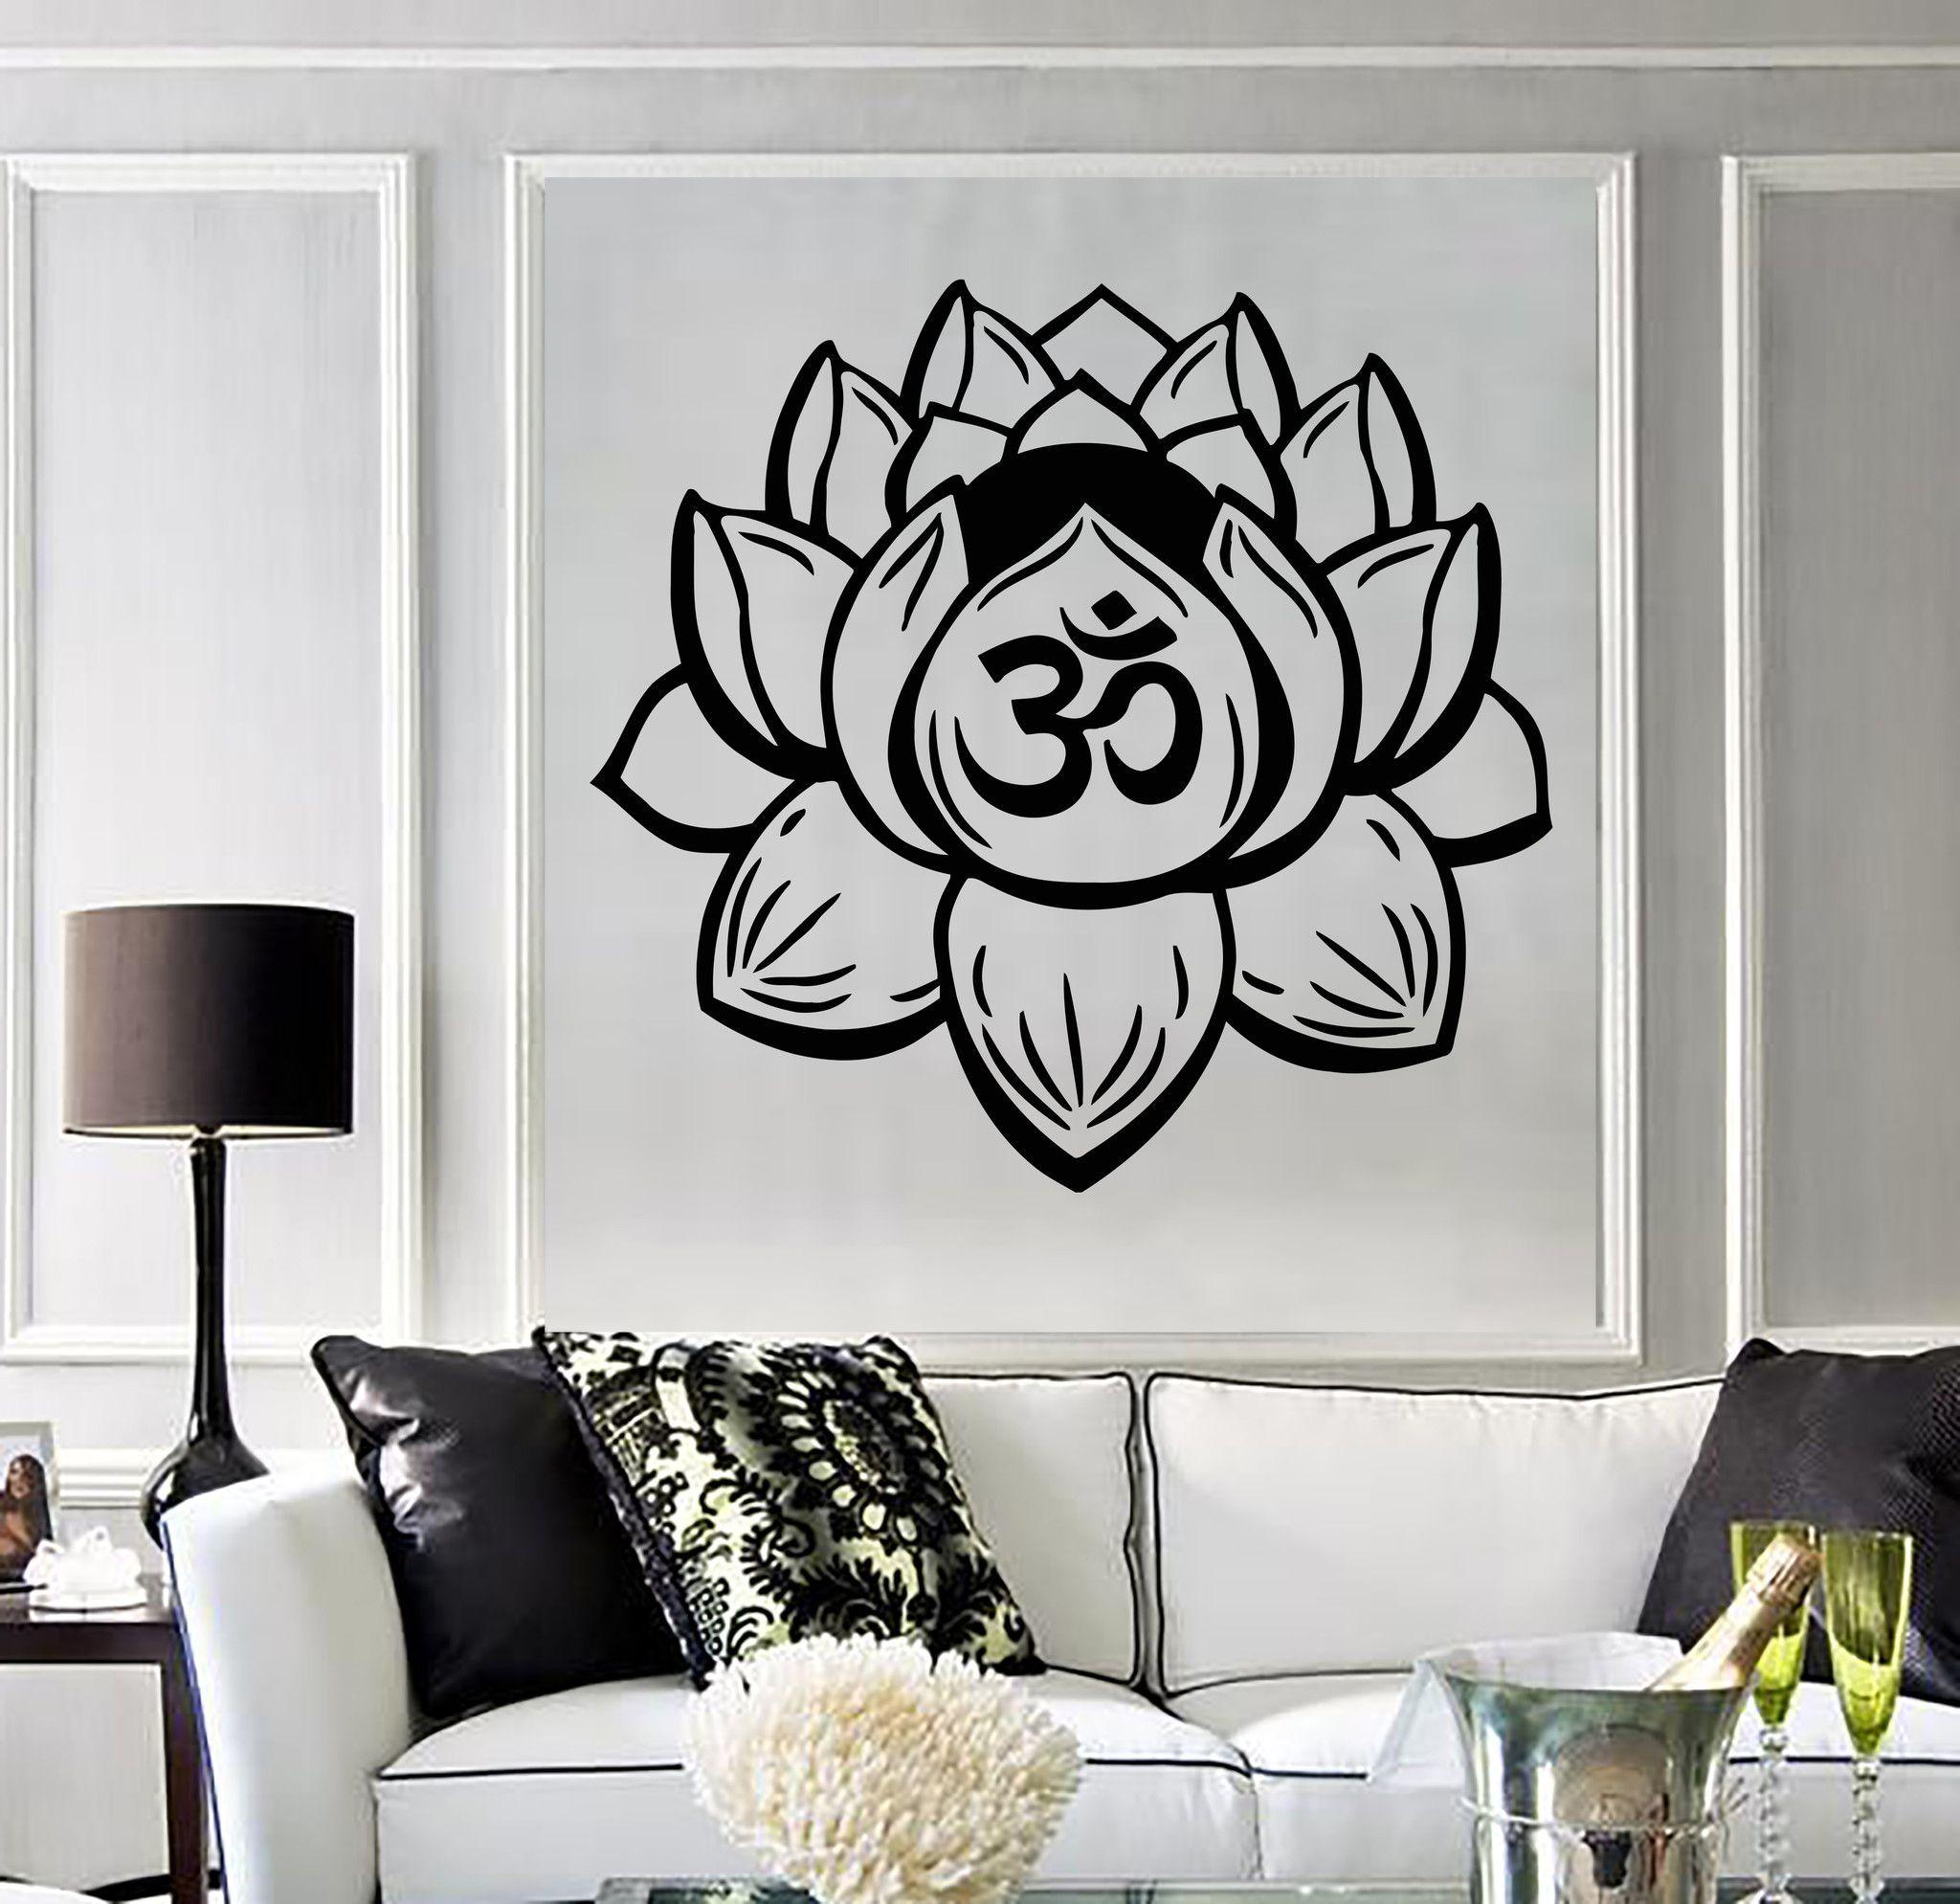 Vinyl Wall Decal Lotus Flower Yoga Buddhist Meditation Bedroom - Zen wall decalsvinyl wall decal yin yang yoga zen meditation bedroom decor